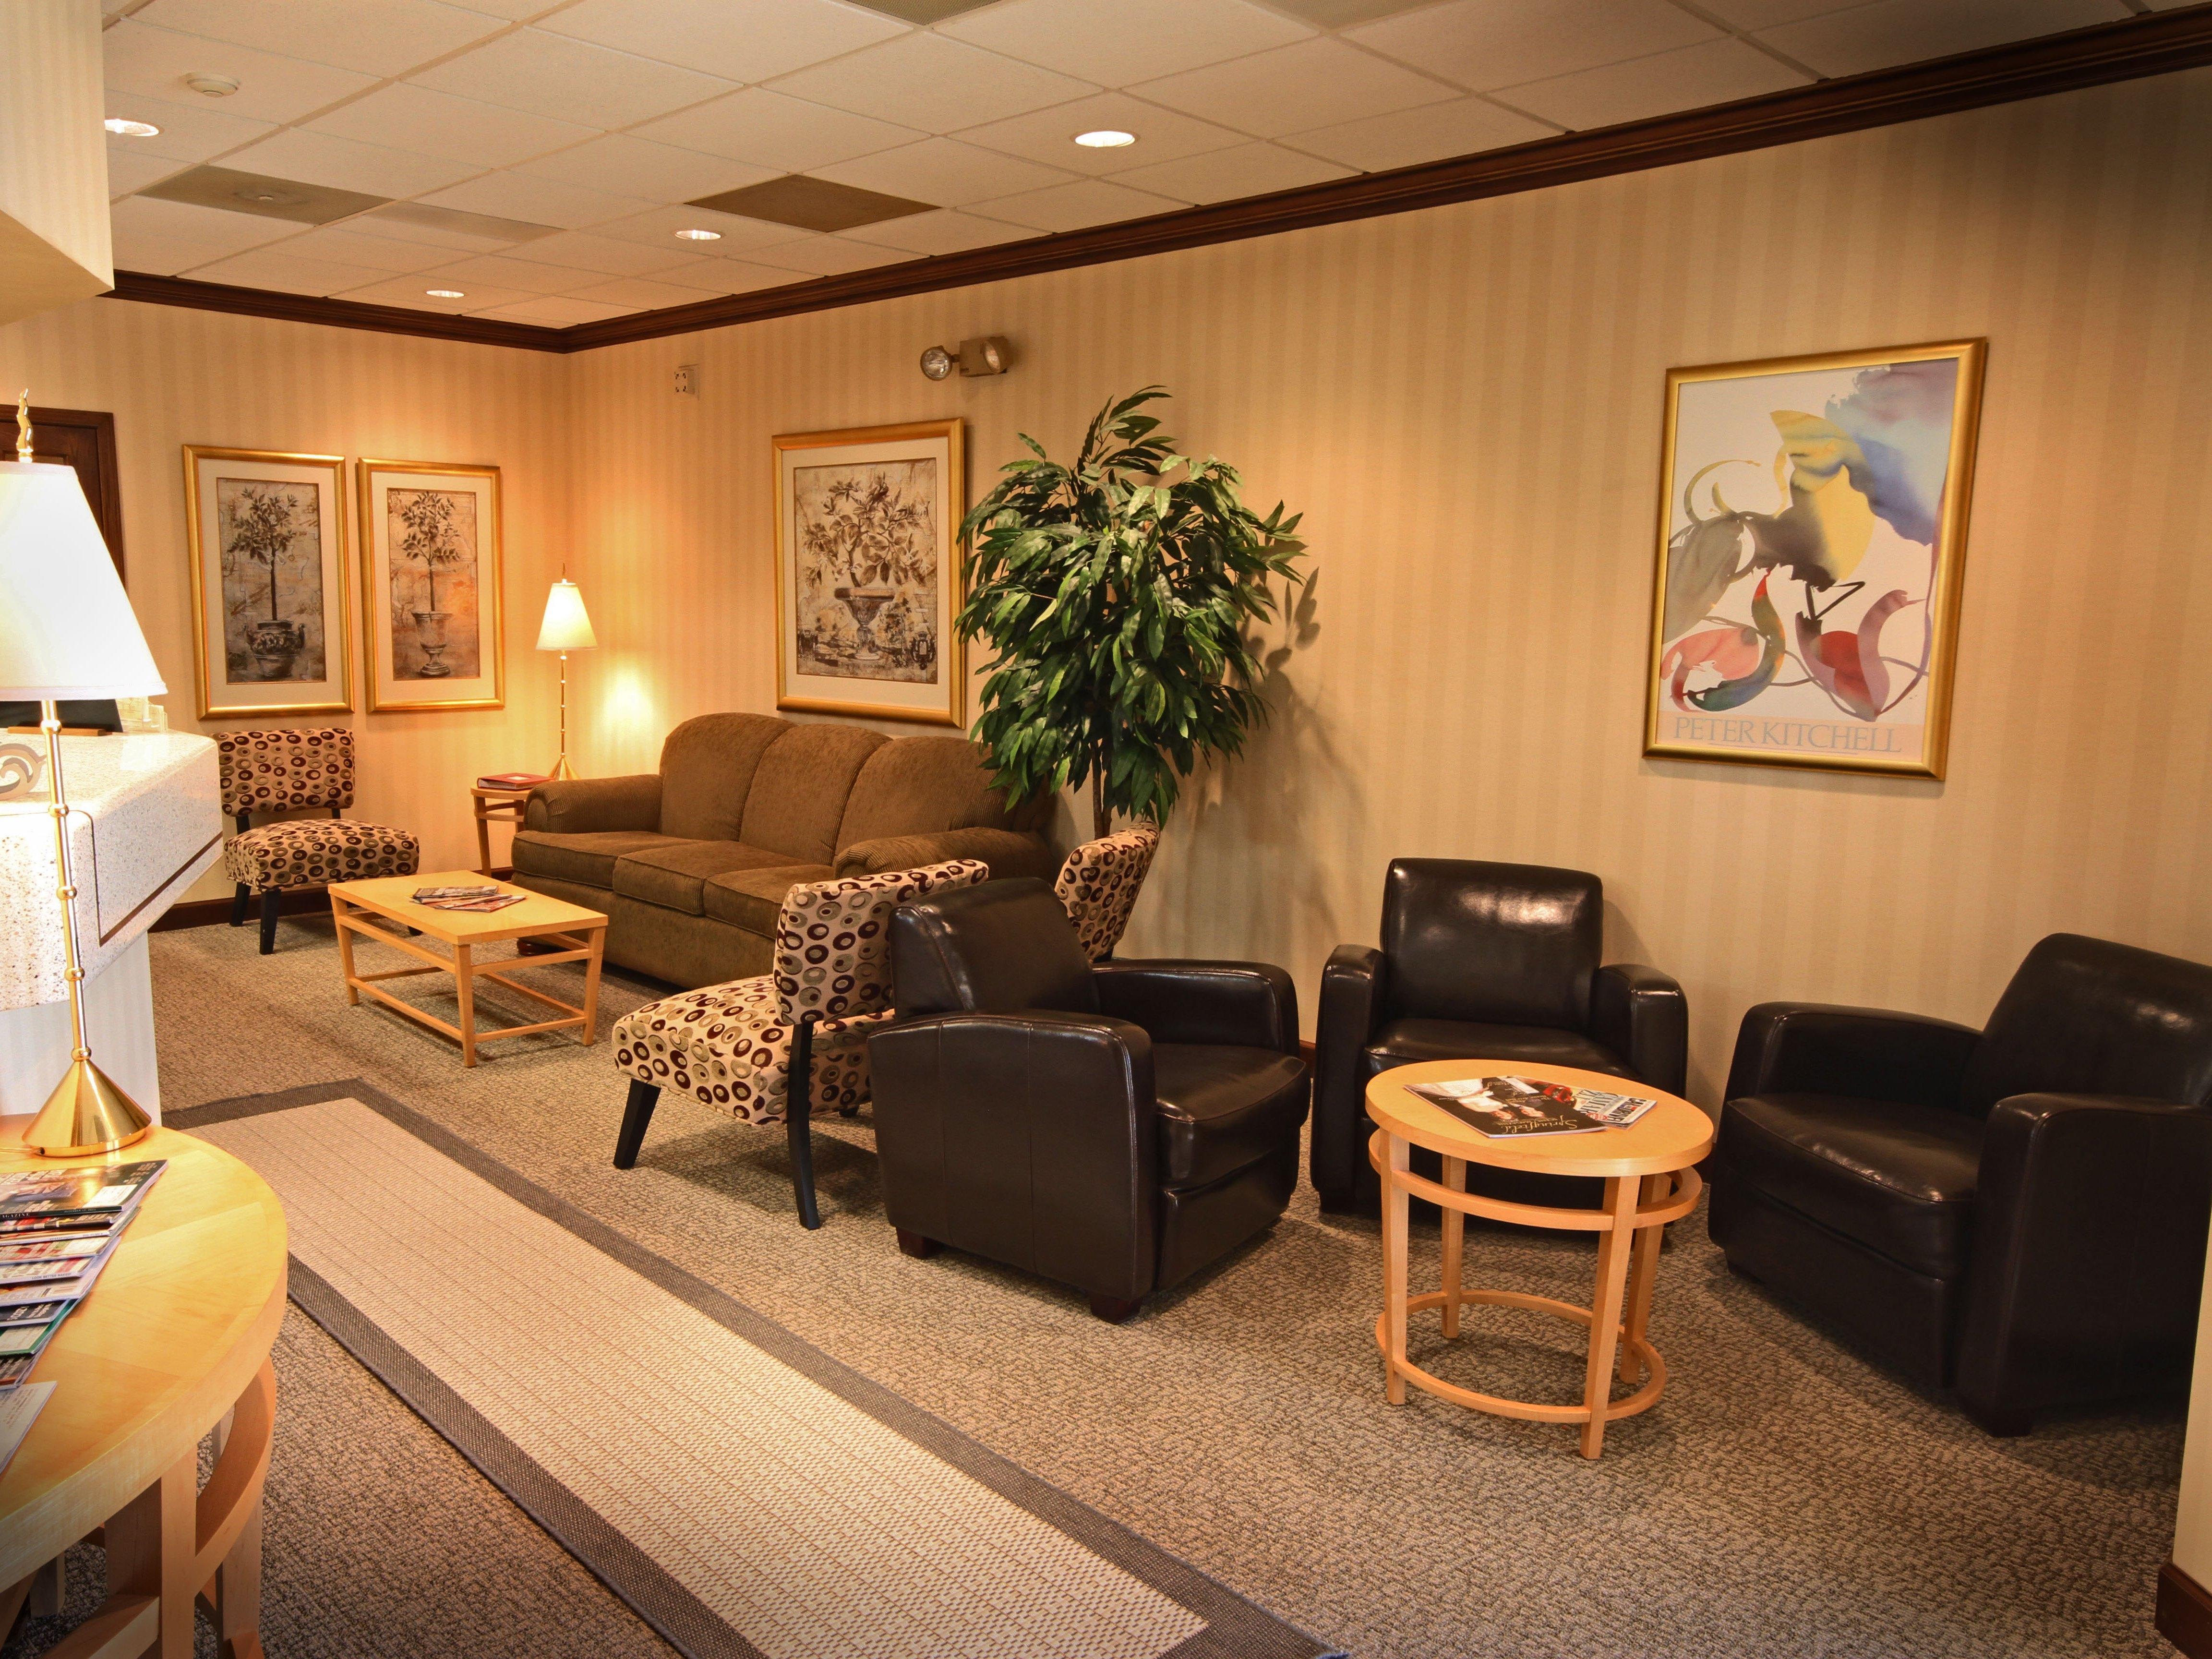 Cedar Point Dental Springfield Il Company Information